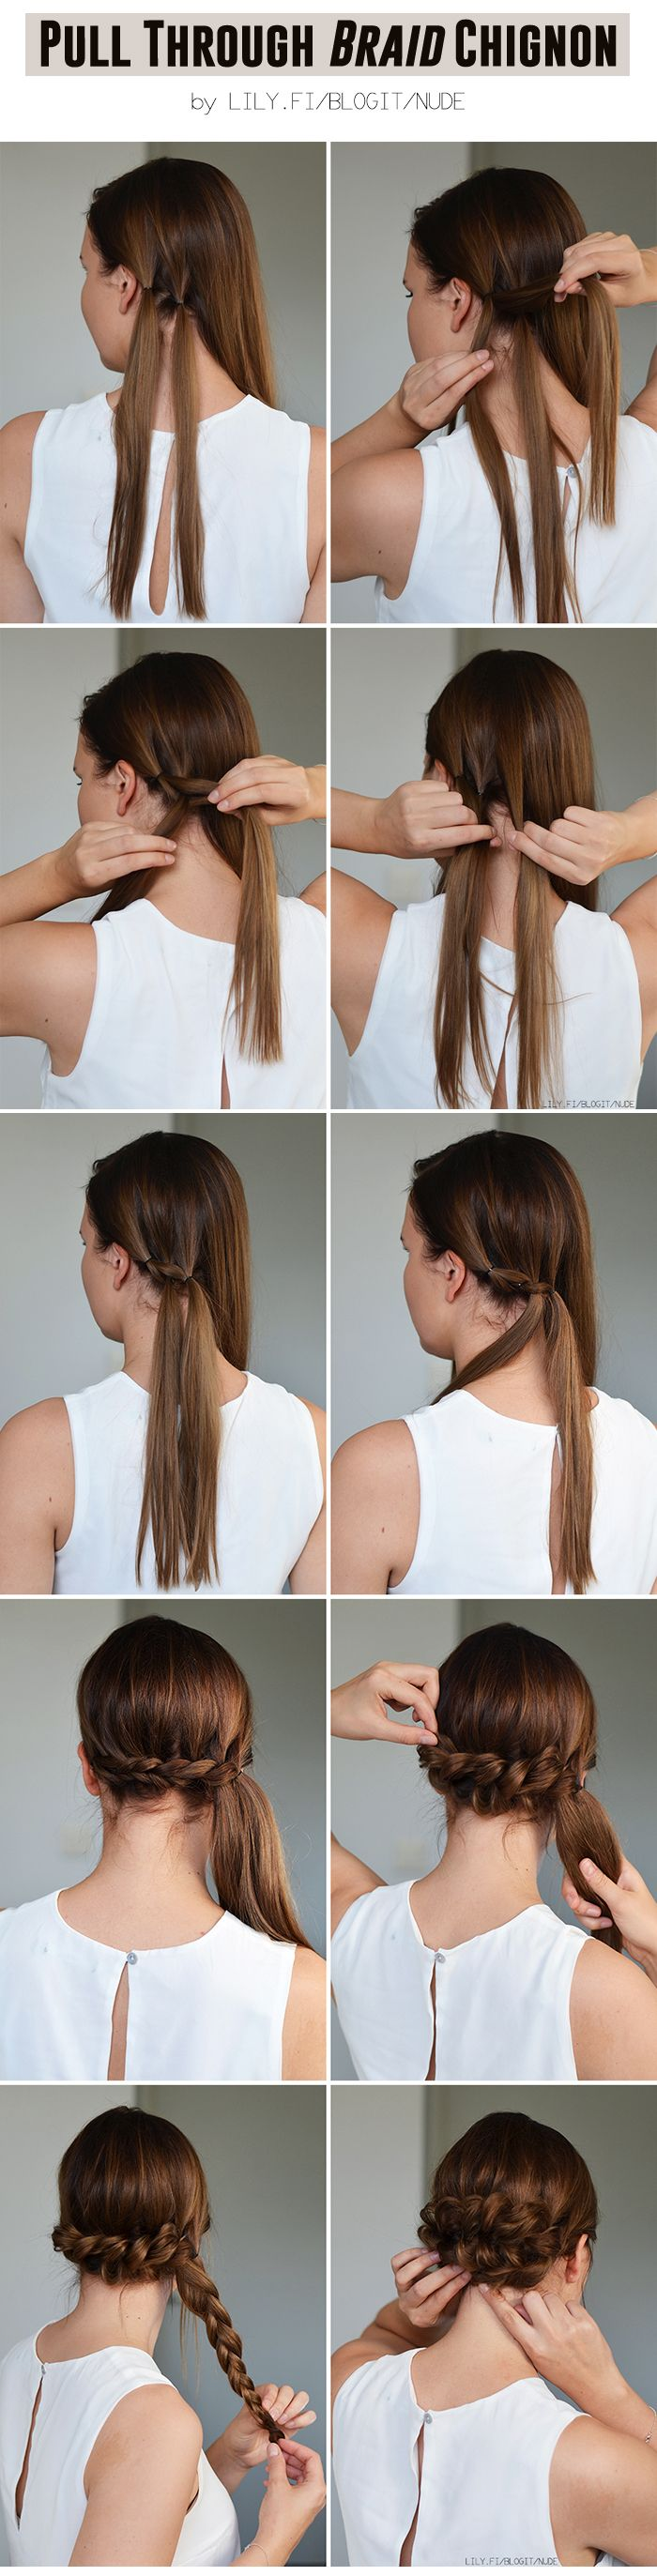 Kampaustutorial: juhlava ja helppo kiepautusletti-chignon // Hair tutorial: Pull Through Braid Chignon - NUDE